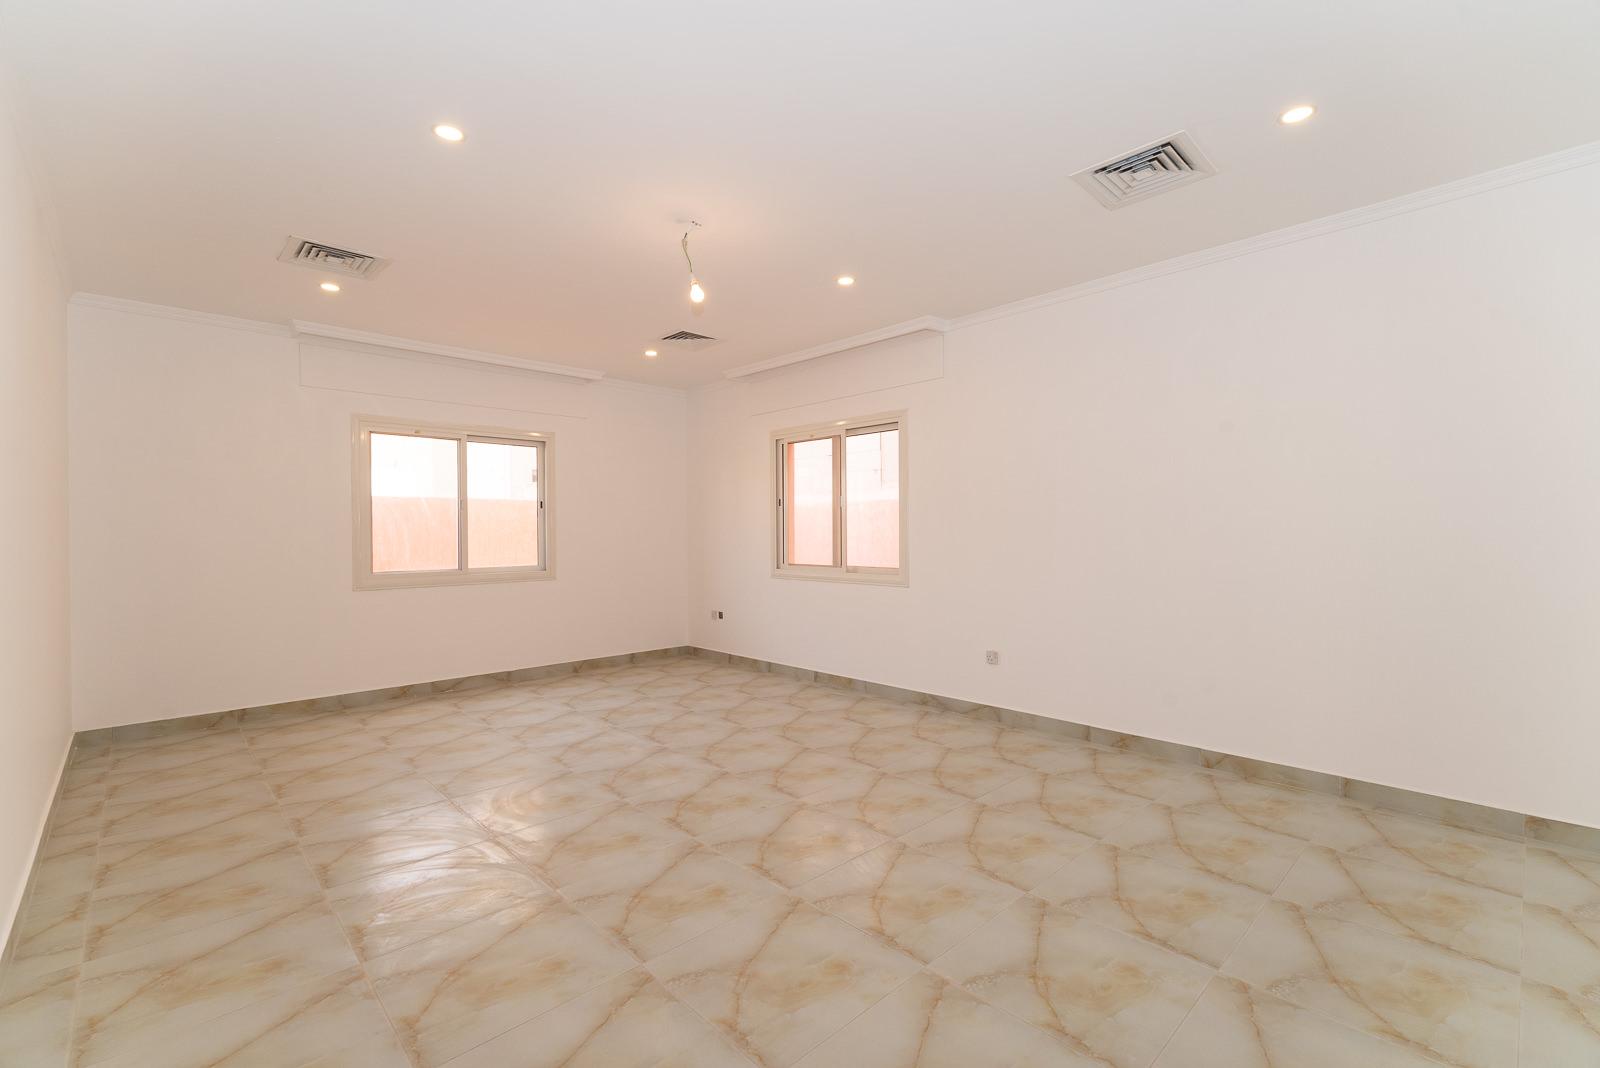 Fnaitees – new, unfurnished four bedroom villa w/yard